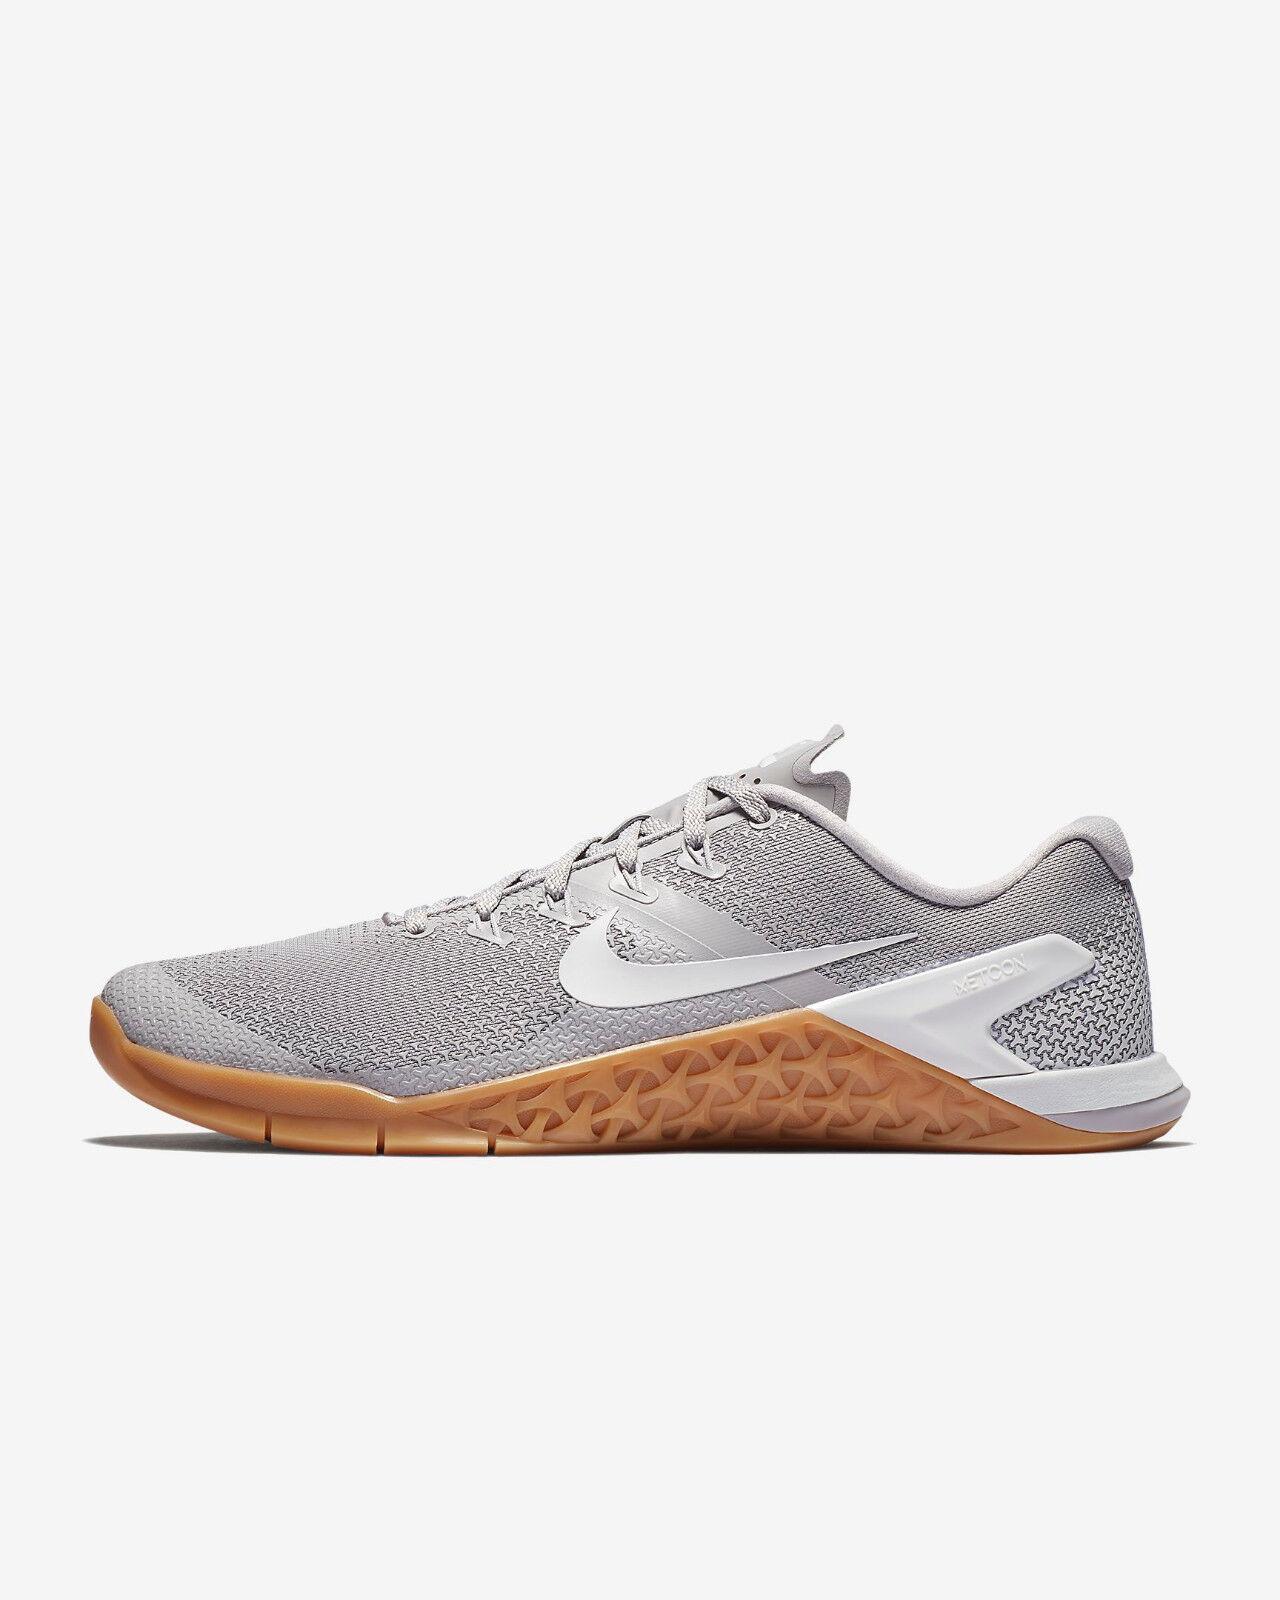 Men's Nike Metcon 4 Grey Gum crossfit training lifter olympic lifting